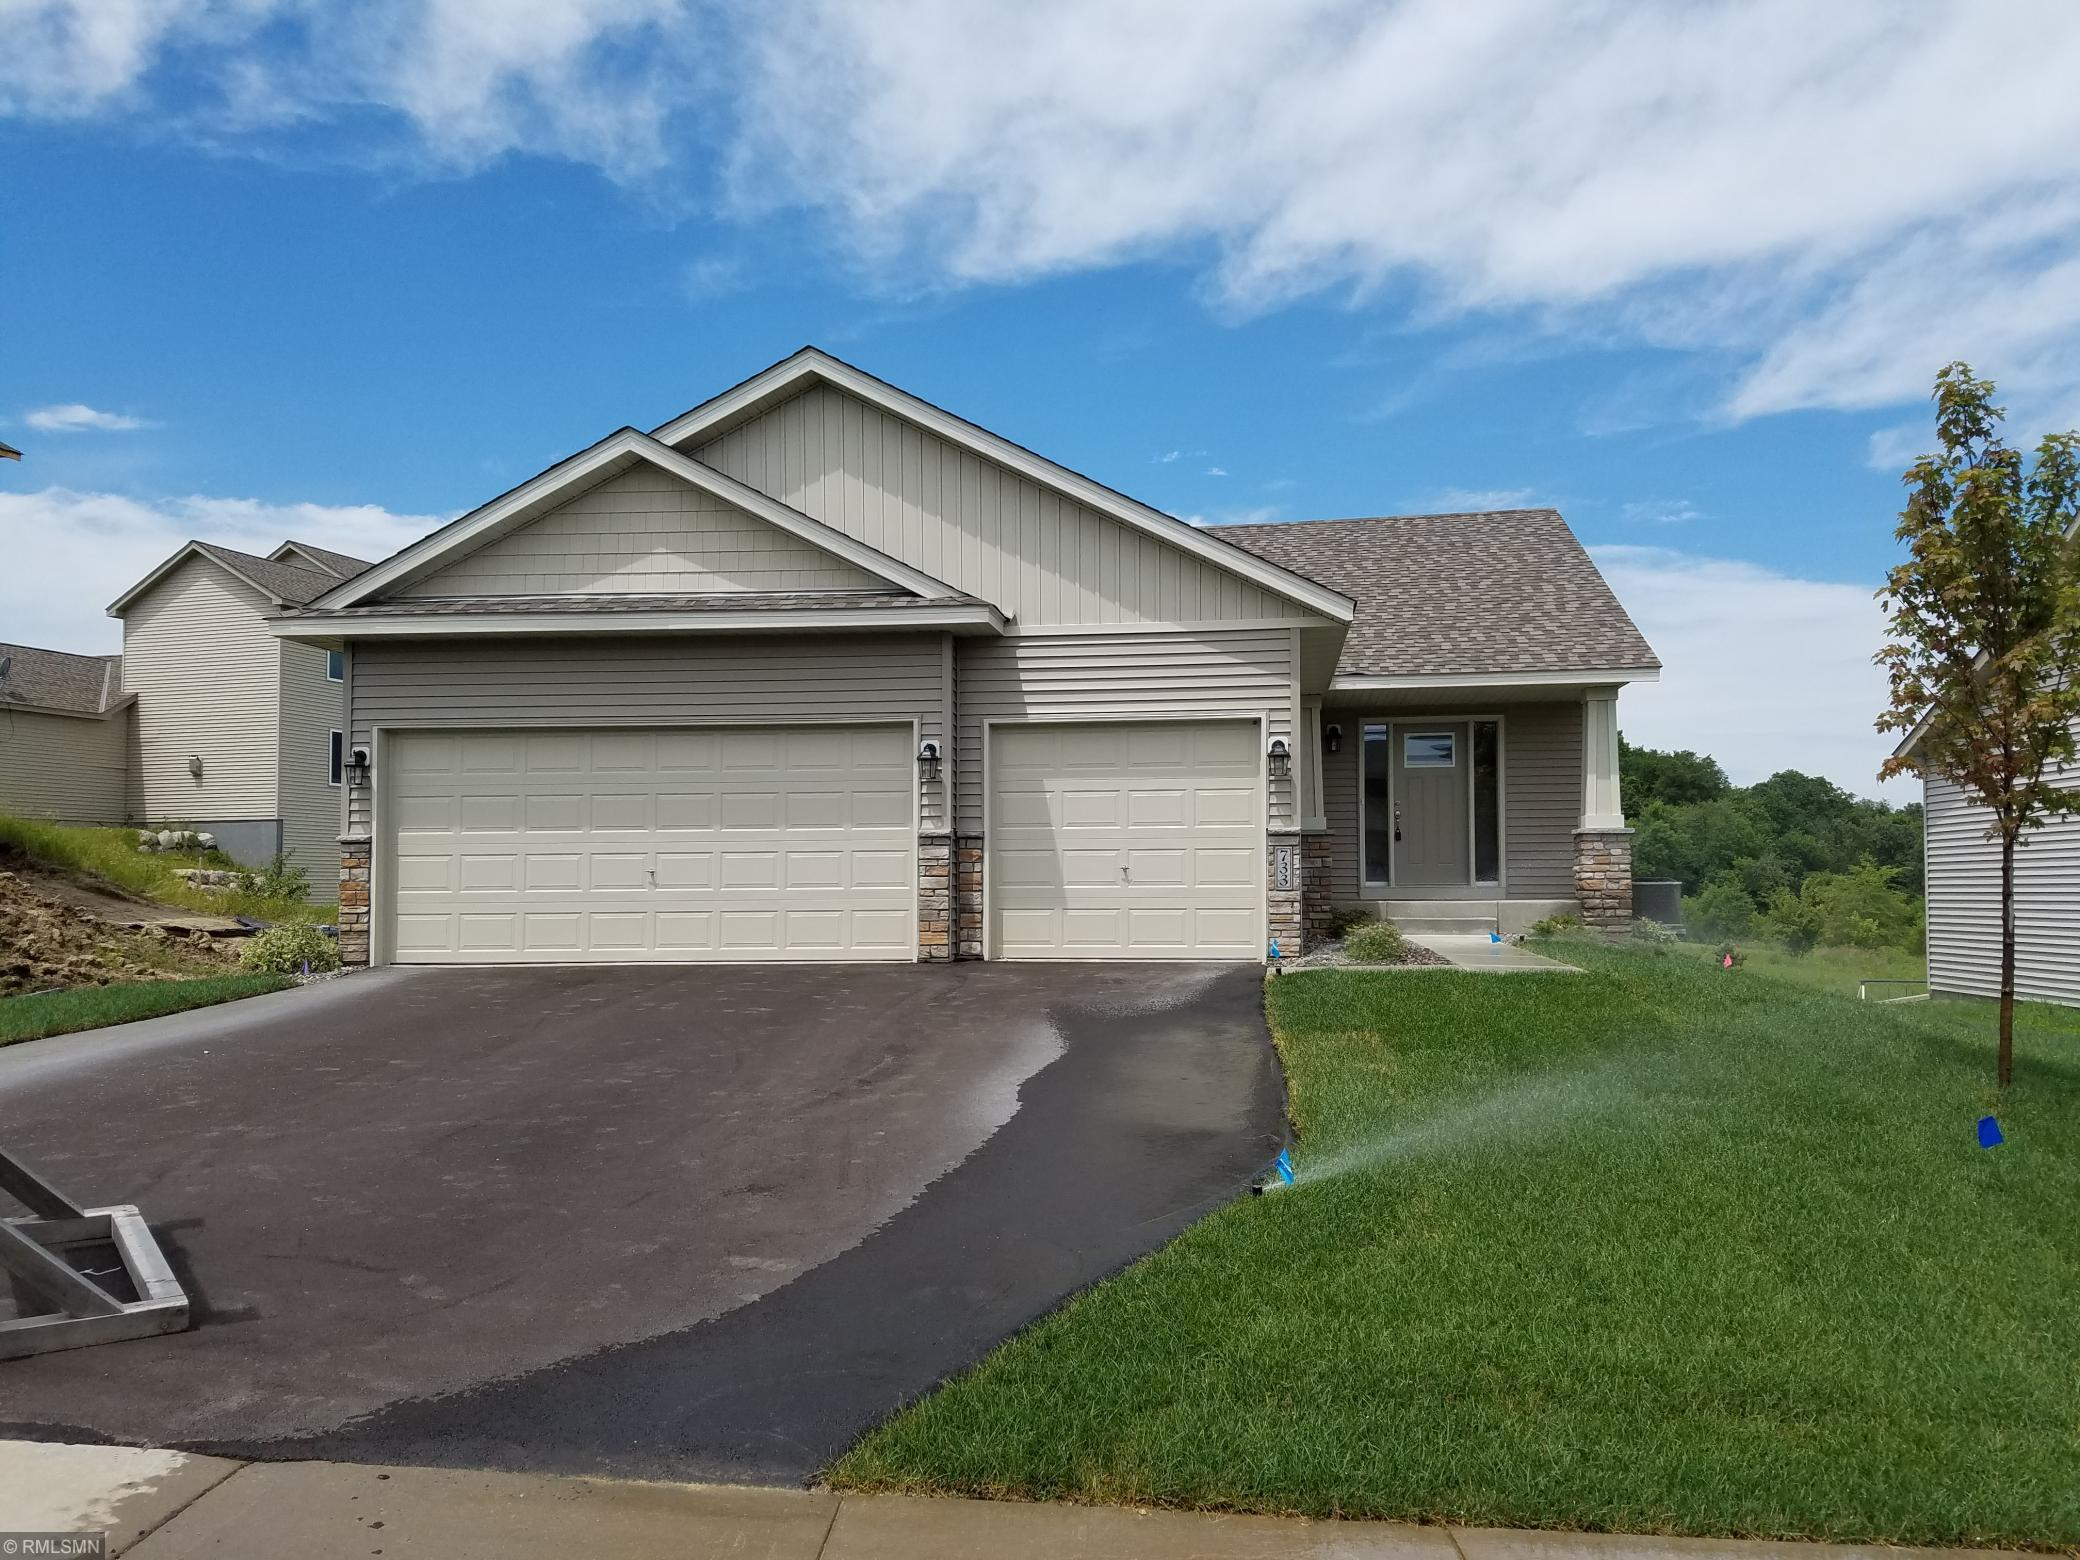 xxx13 Filkins Street Property Photo - Prescott, WI real estate listing